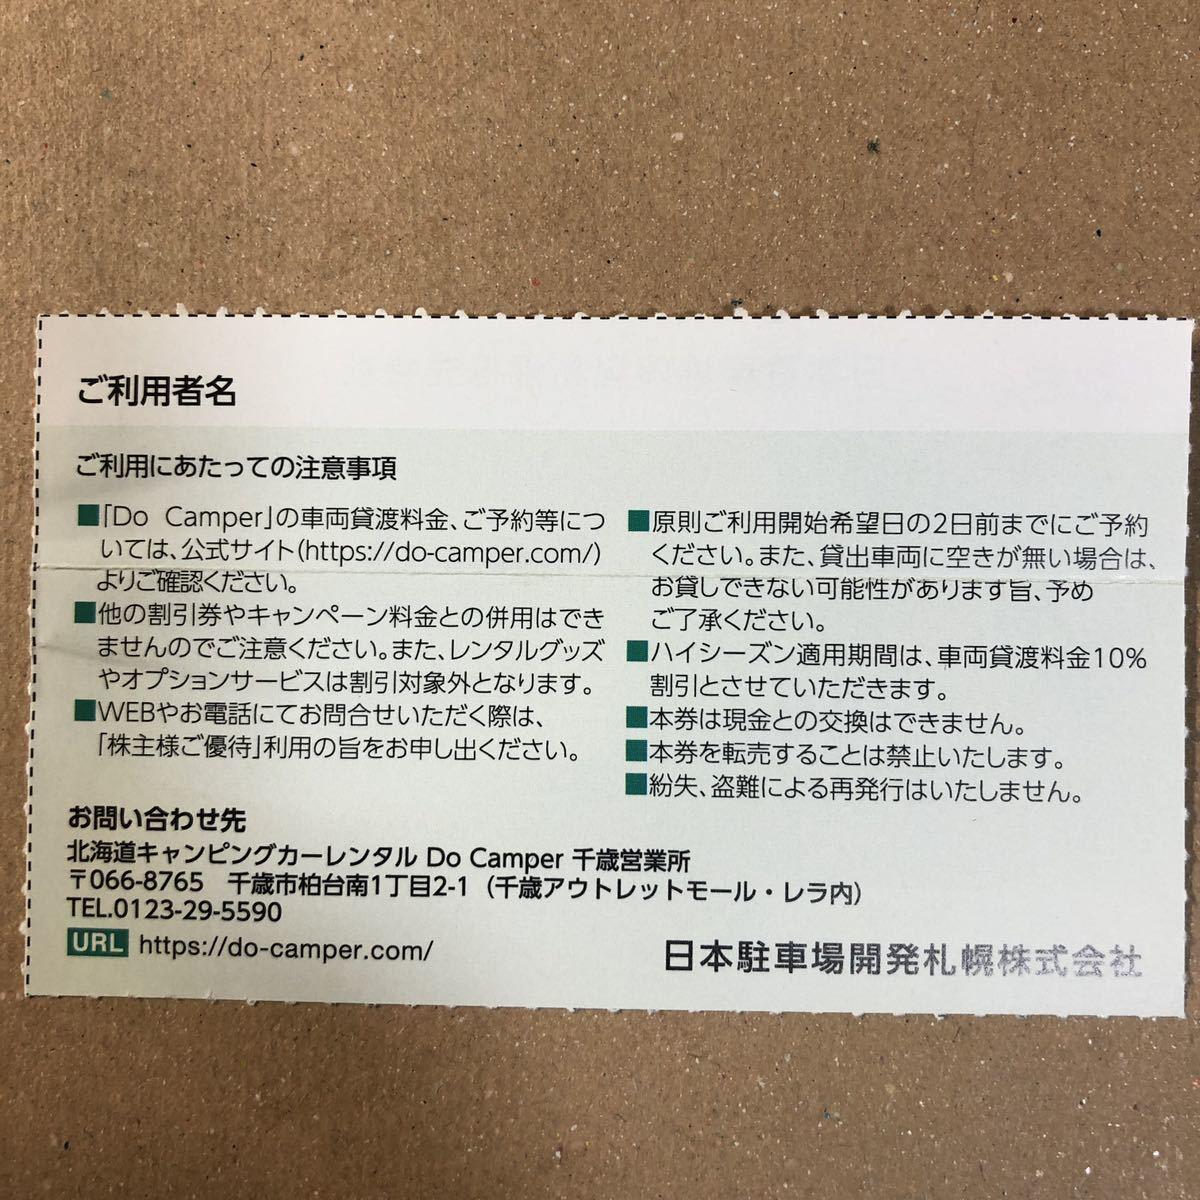 Do Camper 30%割引券 日本駐車場開発 株主優待券 北海道キャンピングカー クーポン券_画像2